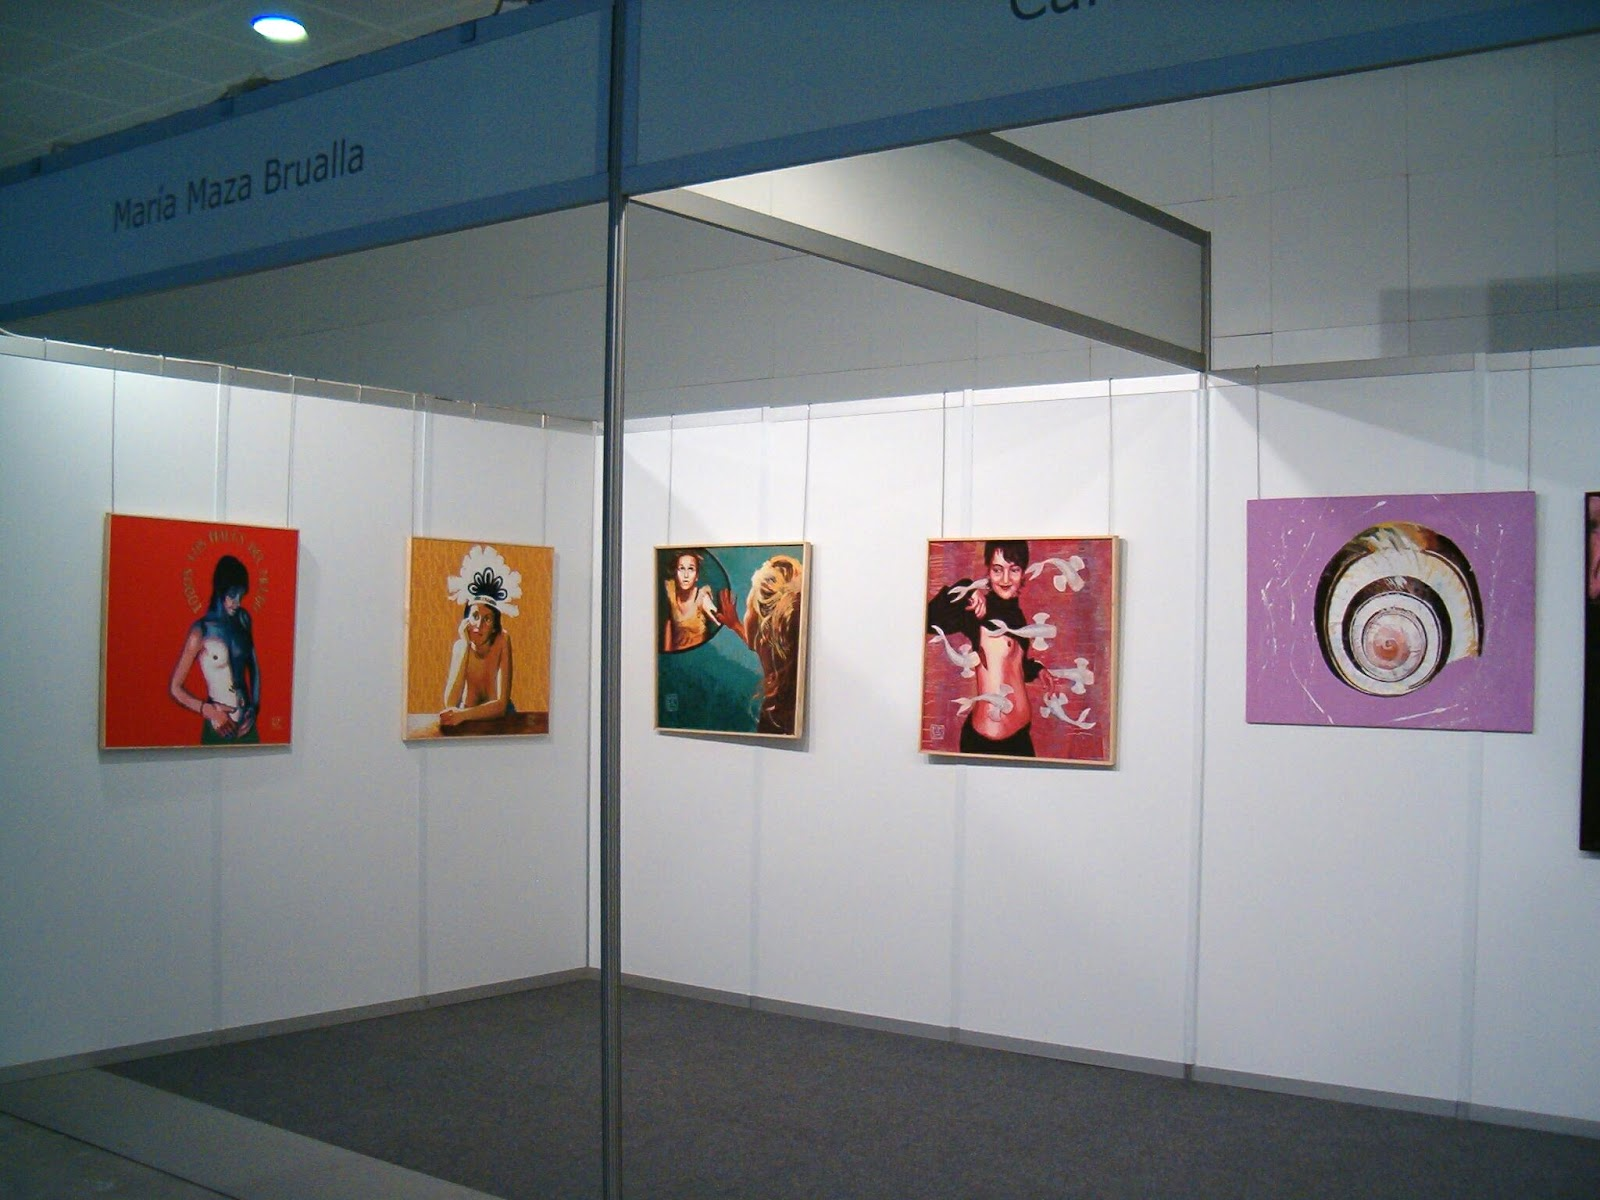 Obras de Maria Maza